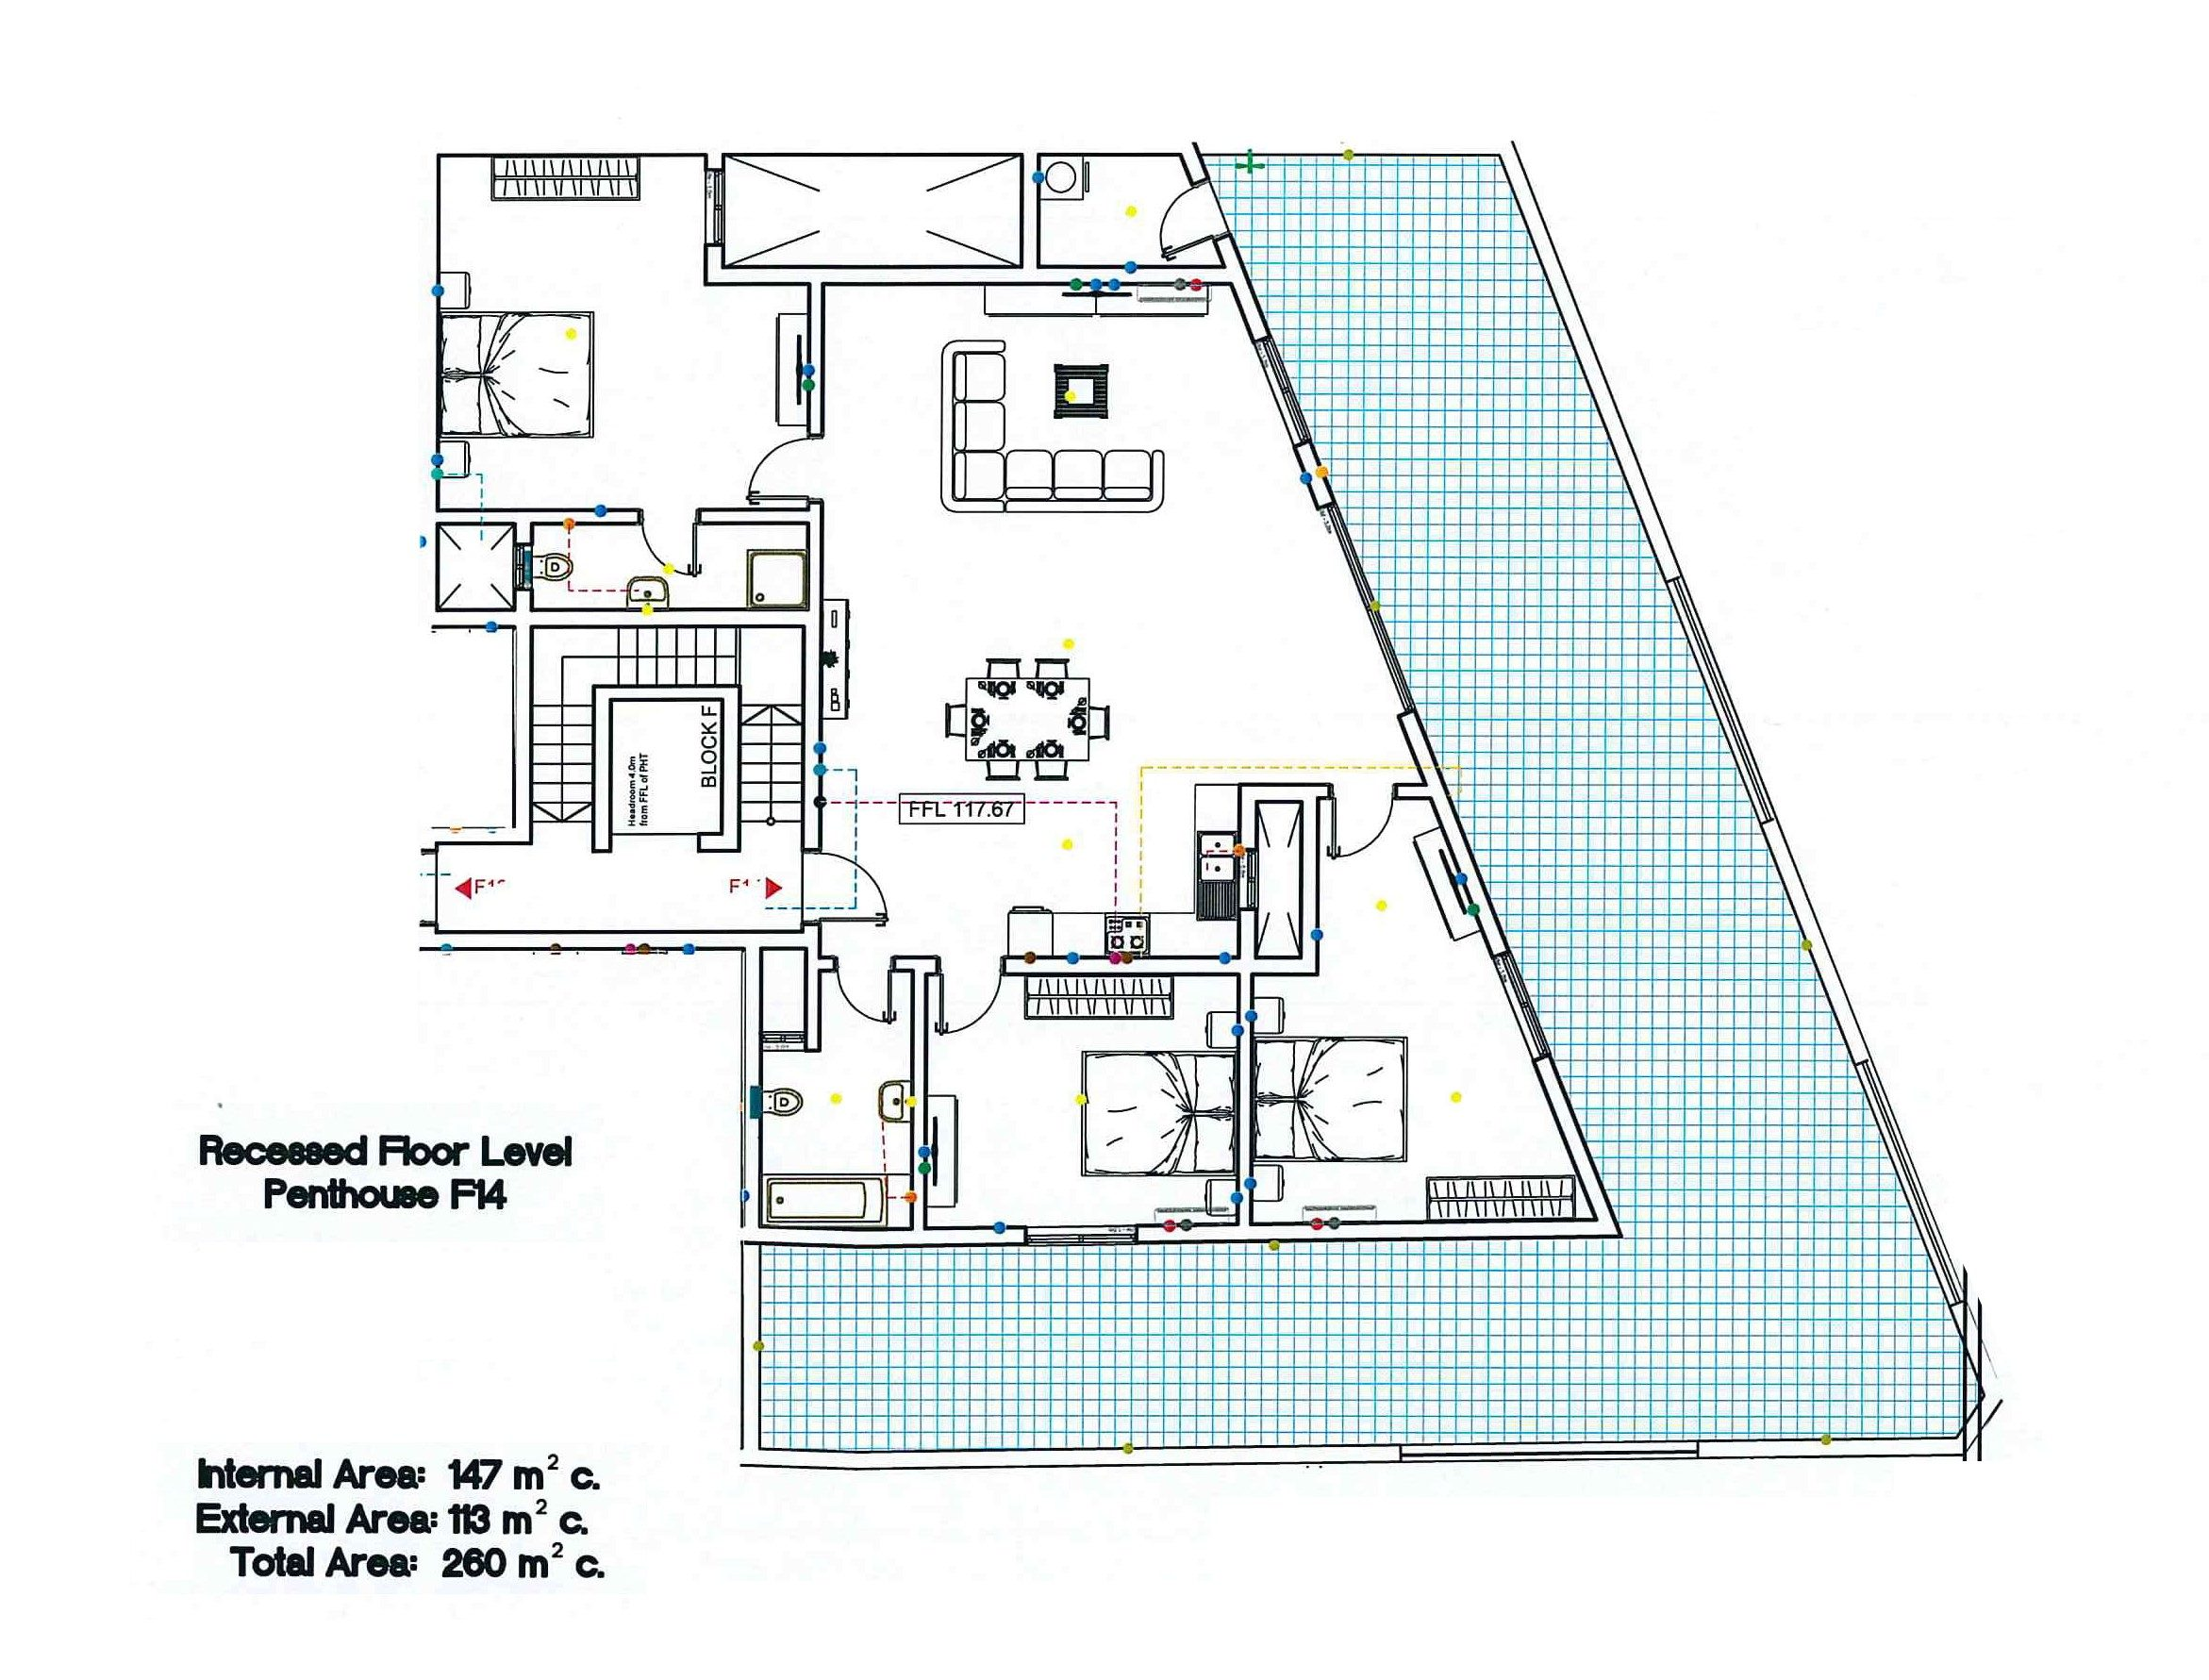 Block F - Penthouse F14